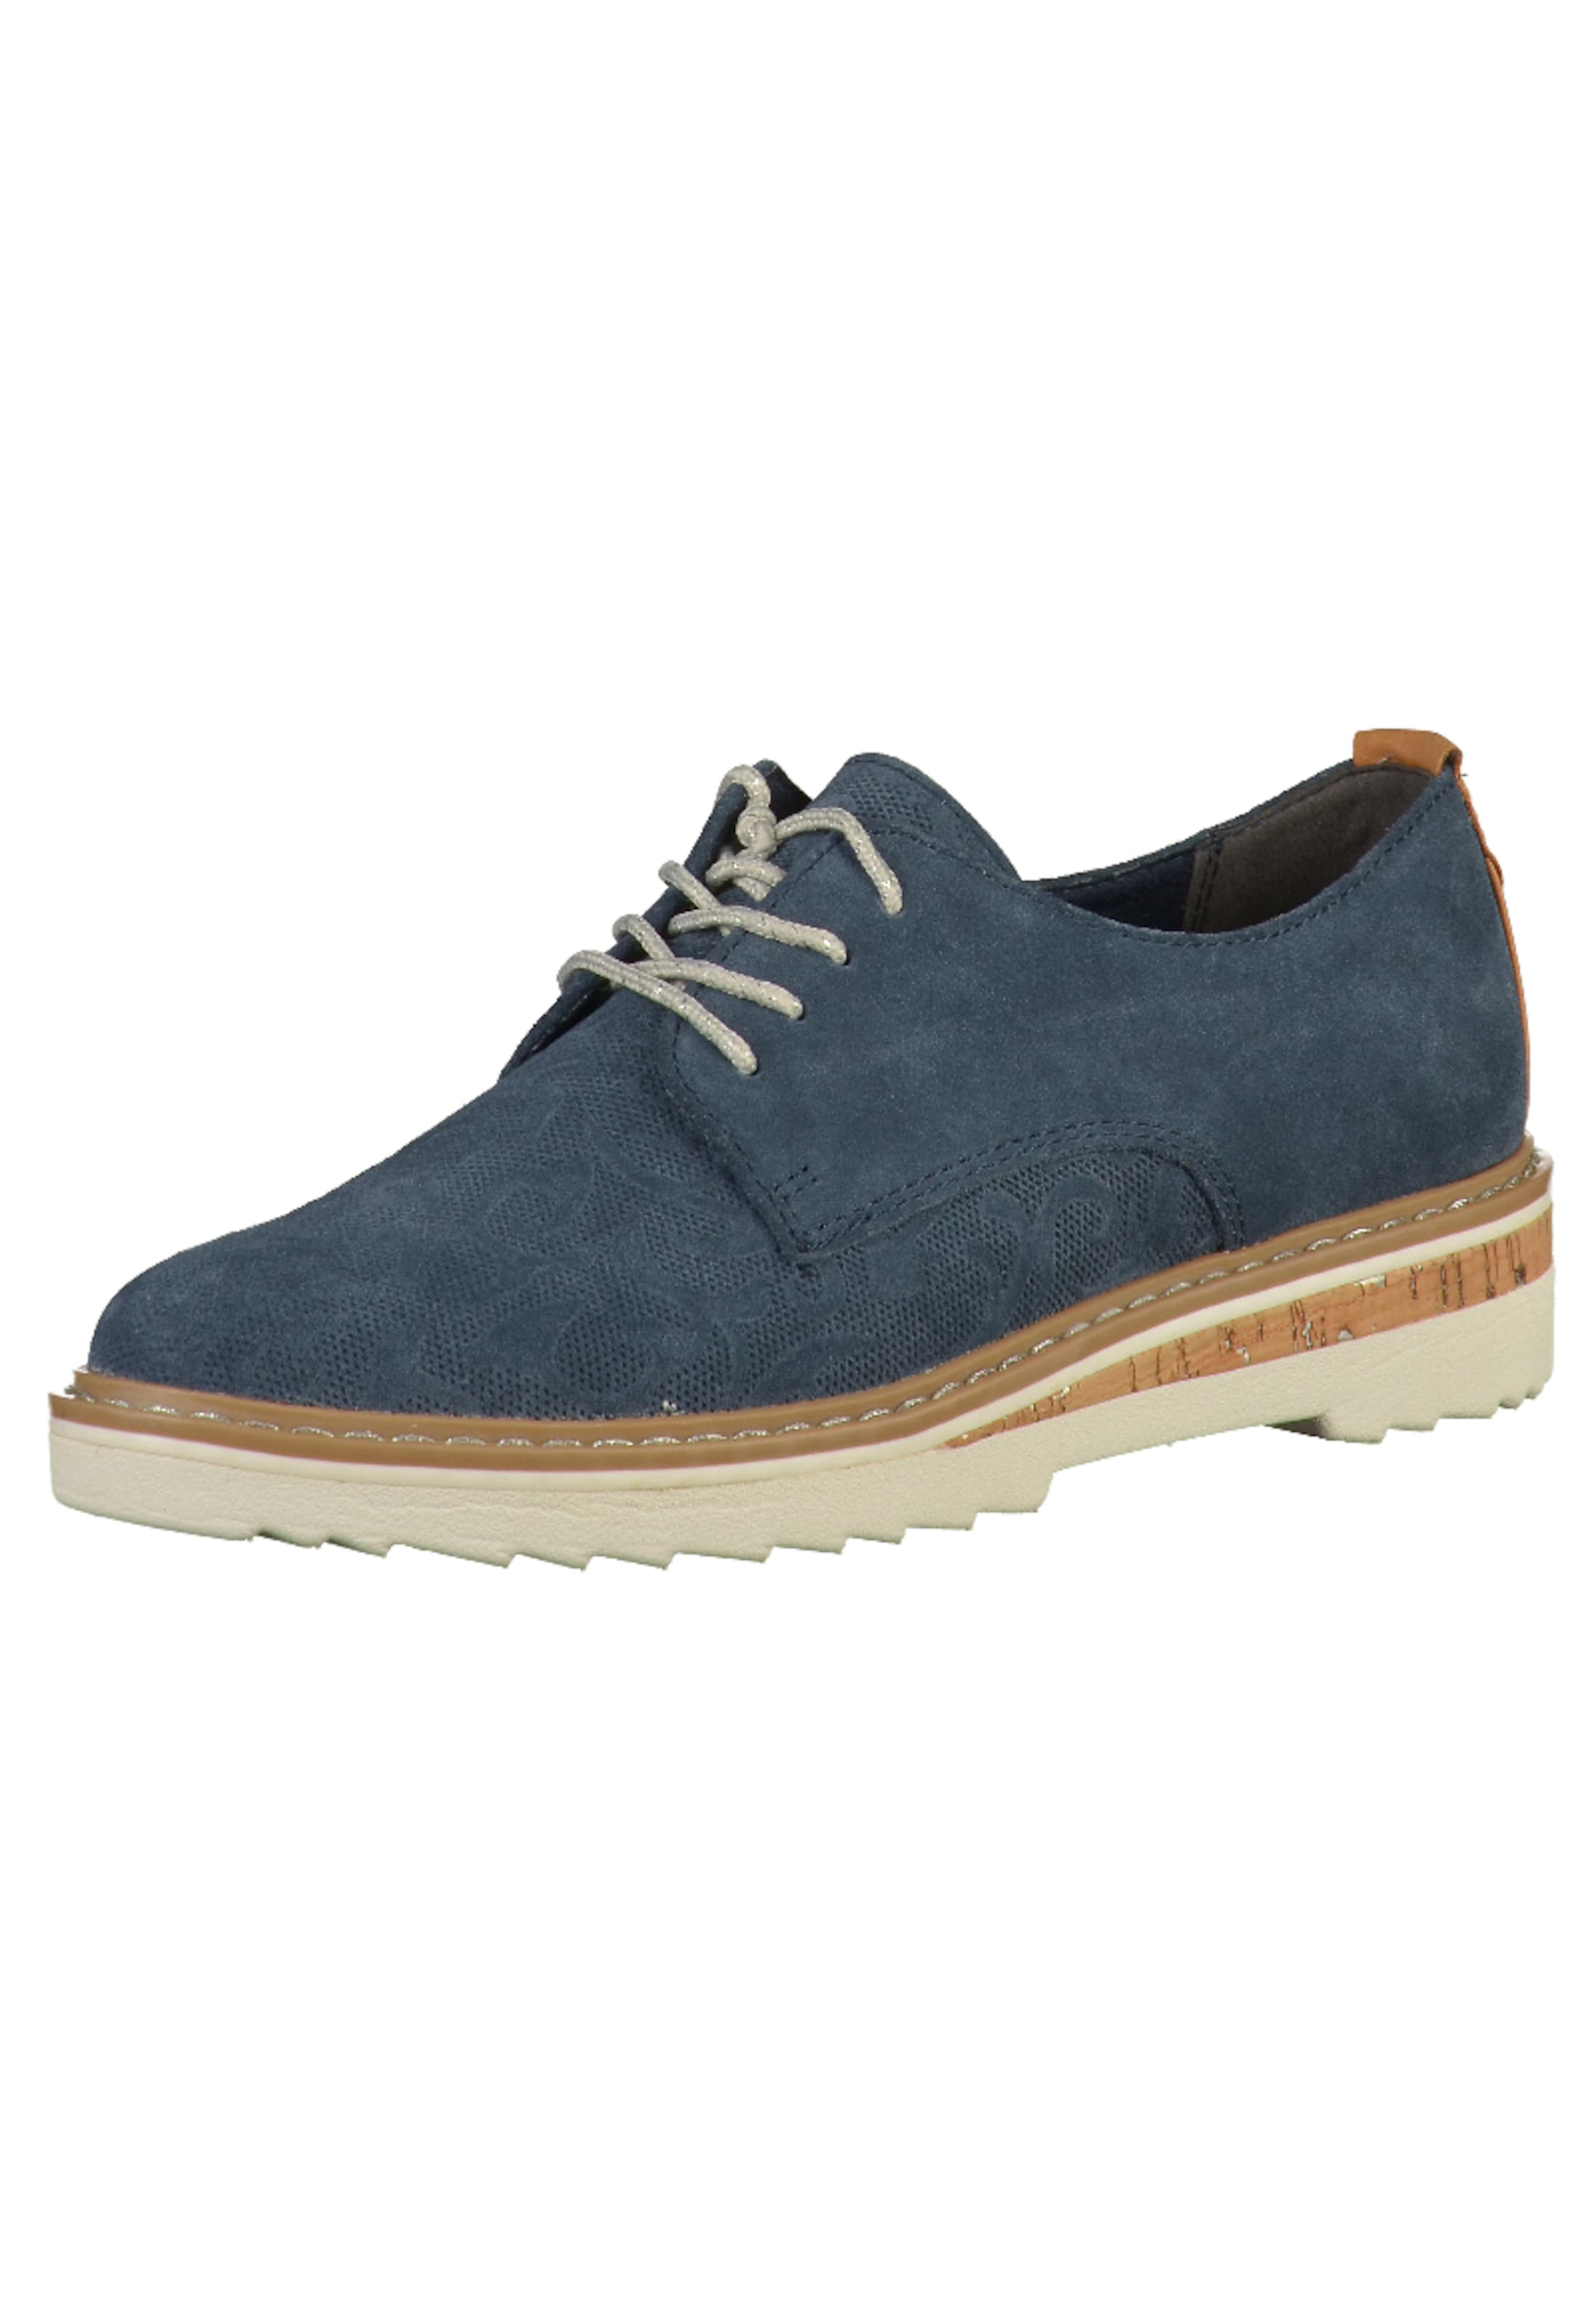 MARCO TOZZI Halbschuhe Verschleißfeste billige Schuhe